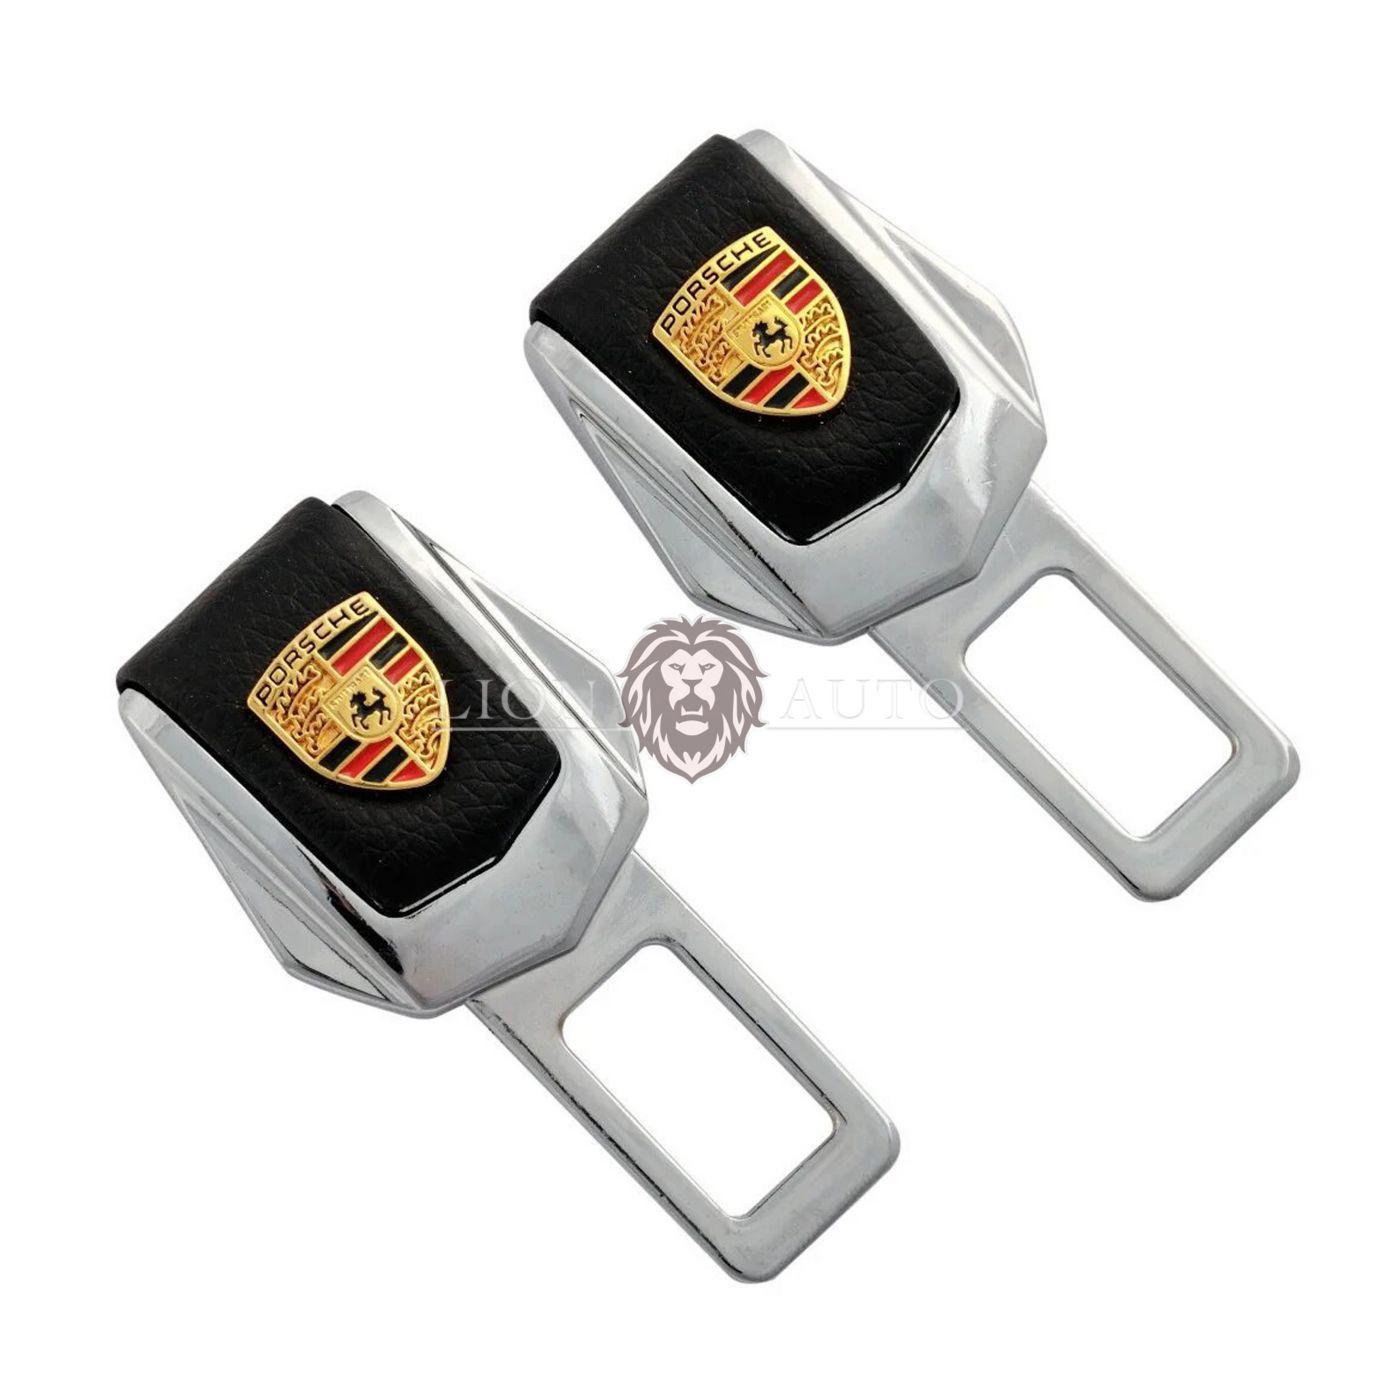 Заглушки ремня безопасности на Porsche (набор)